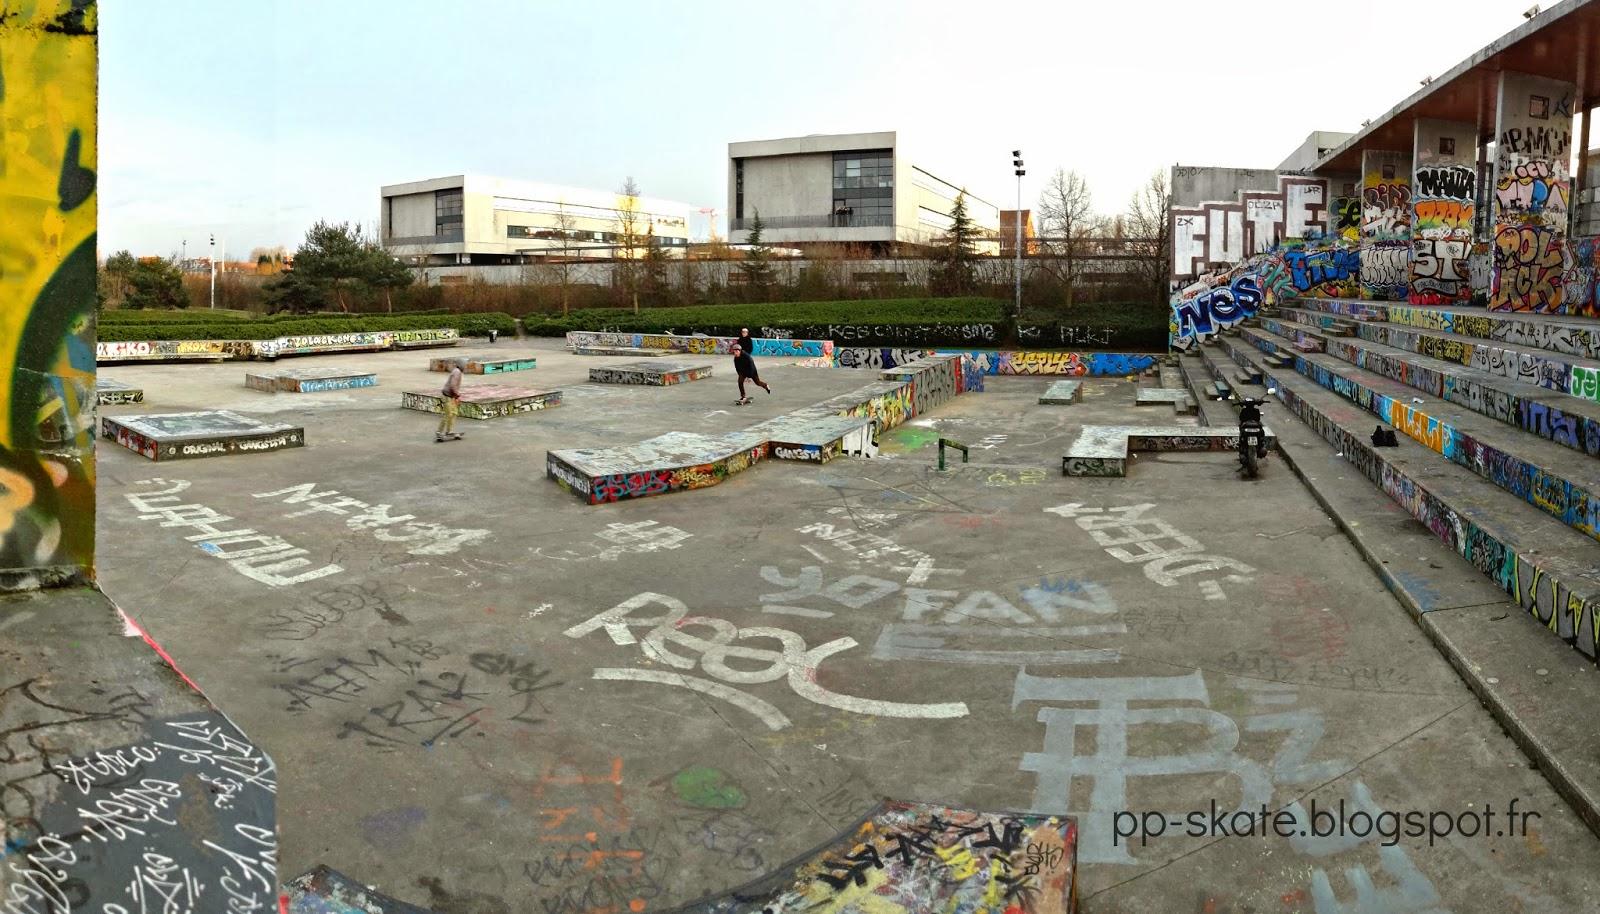 Street park Lille